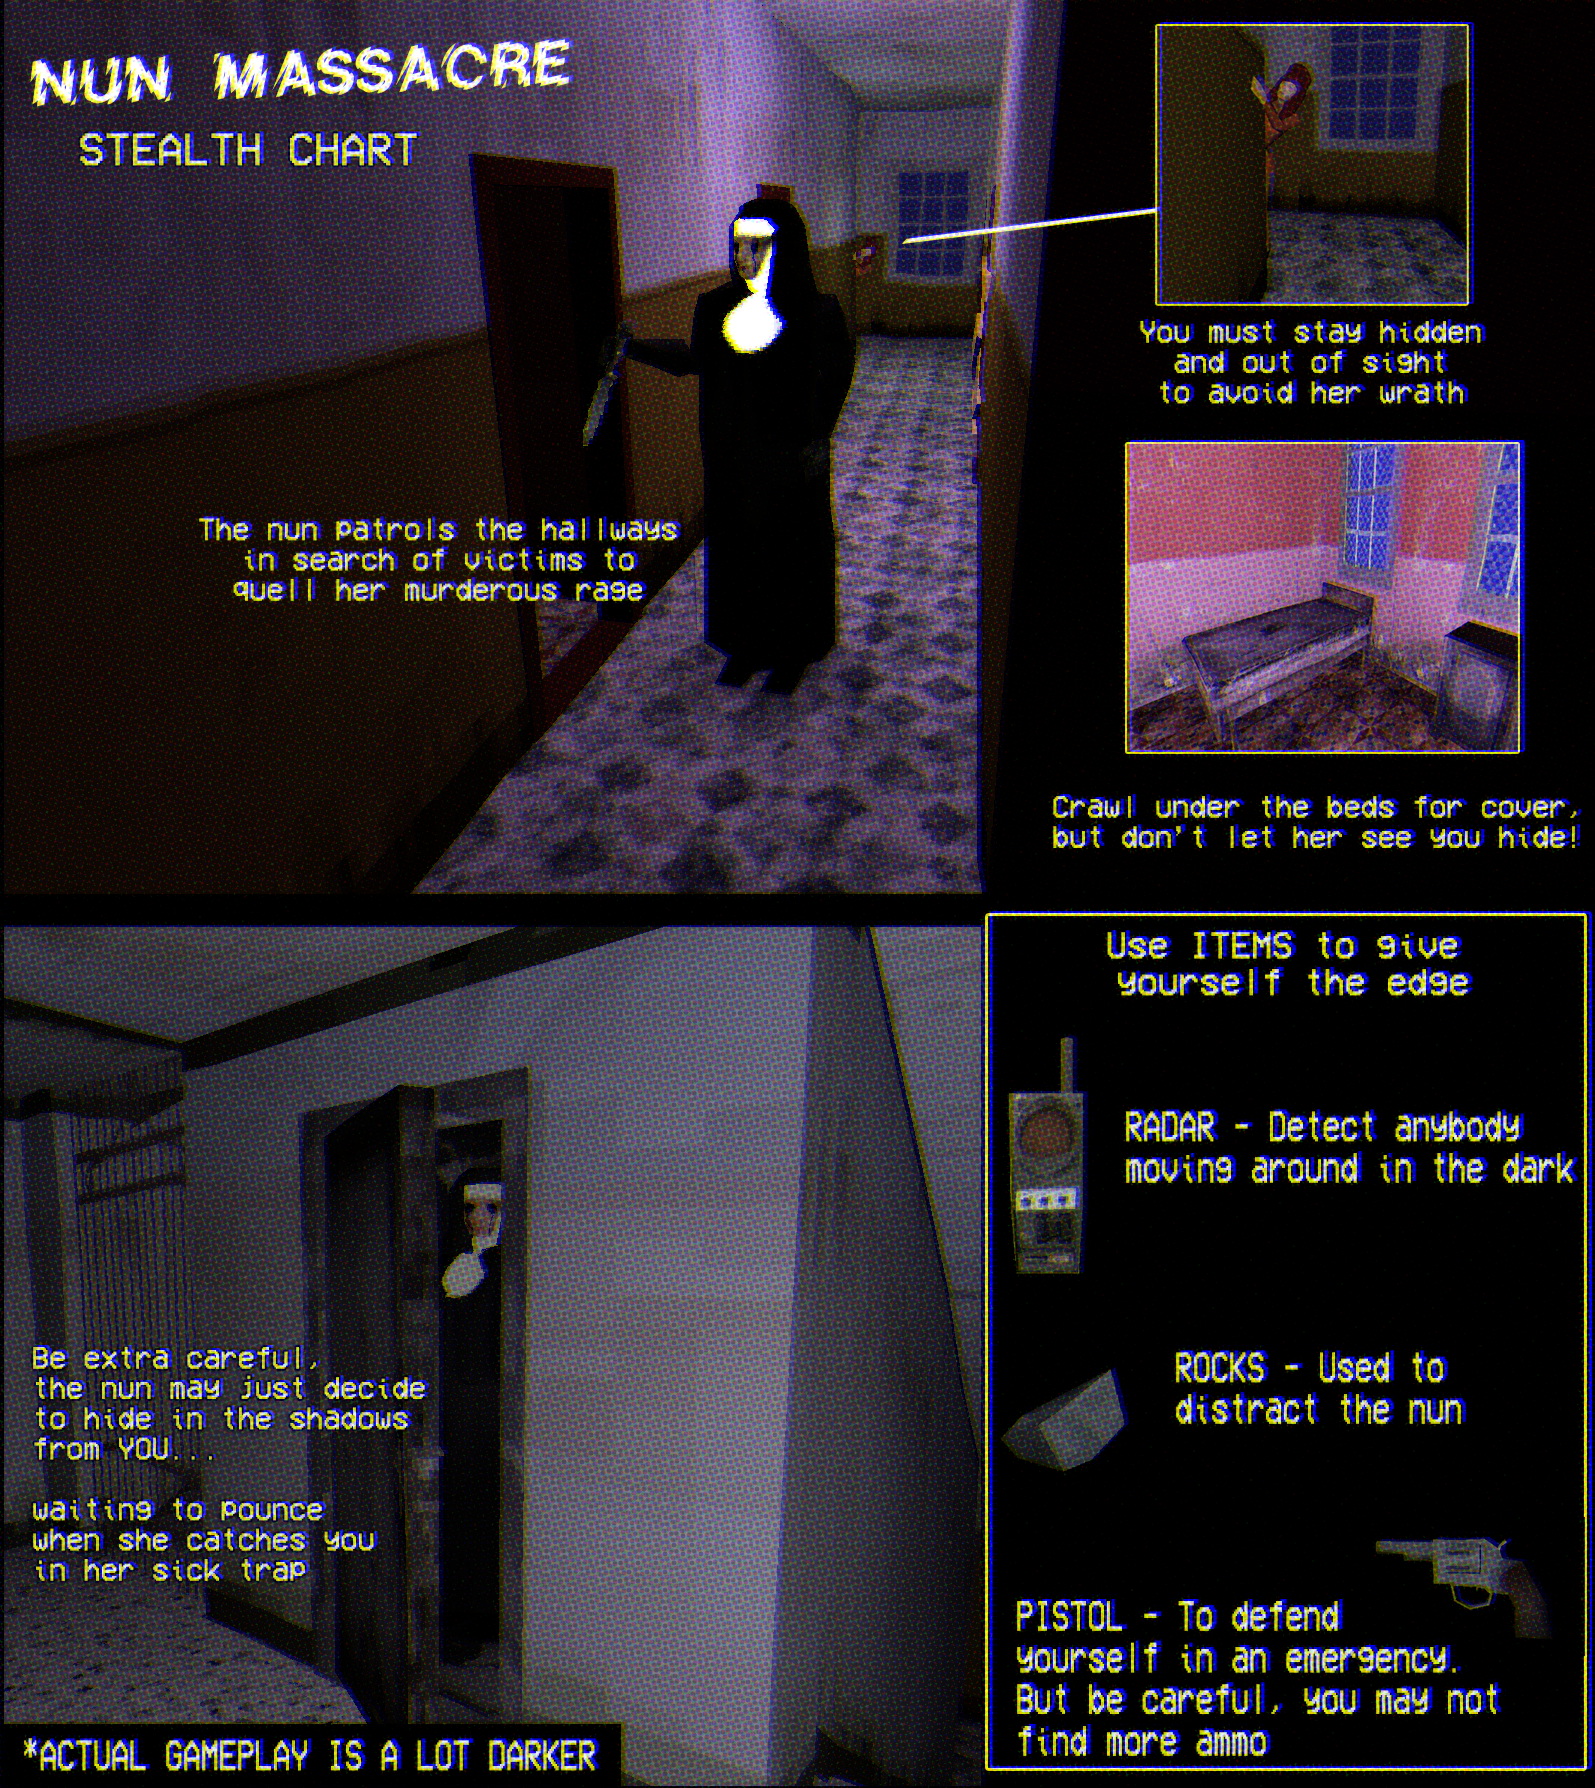 Night of the Nun    aka Nun Massacre by Puppet Combo